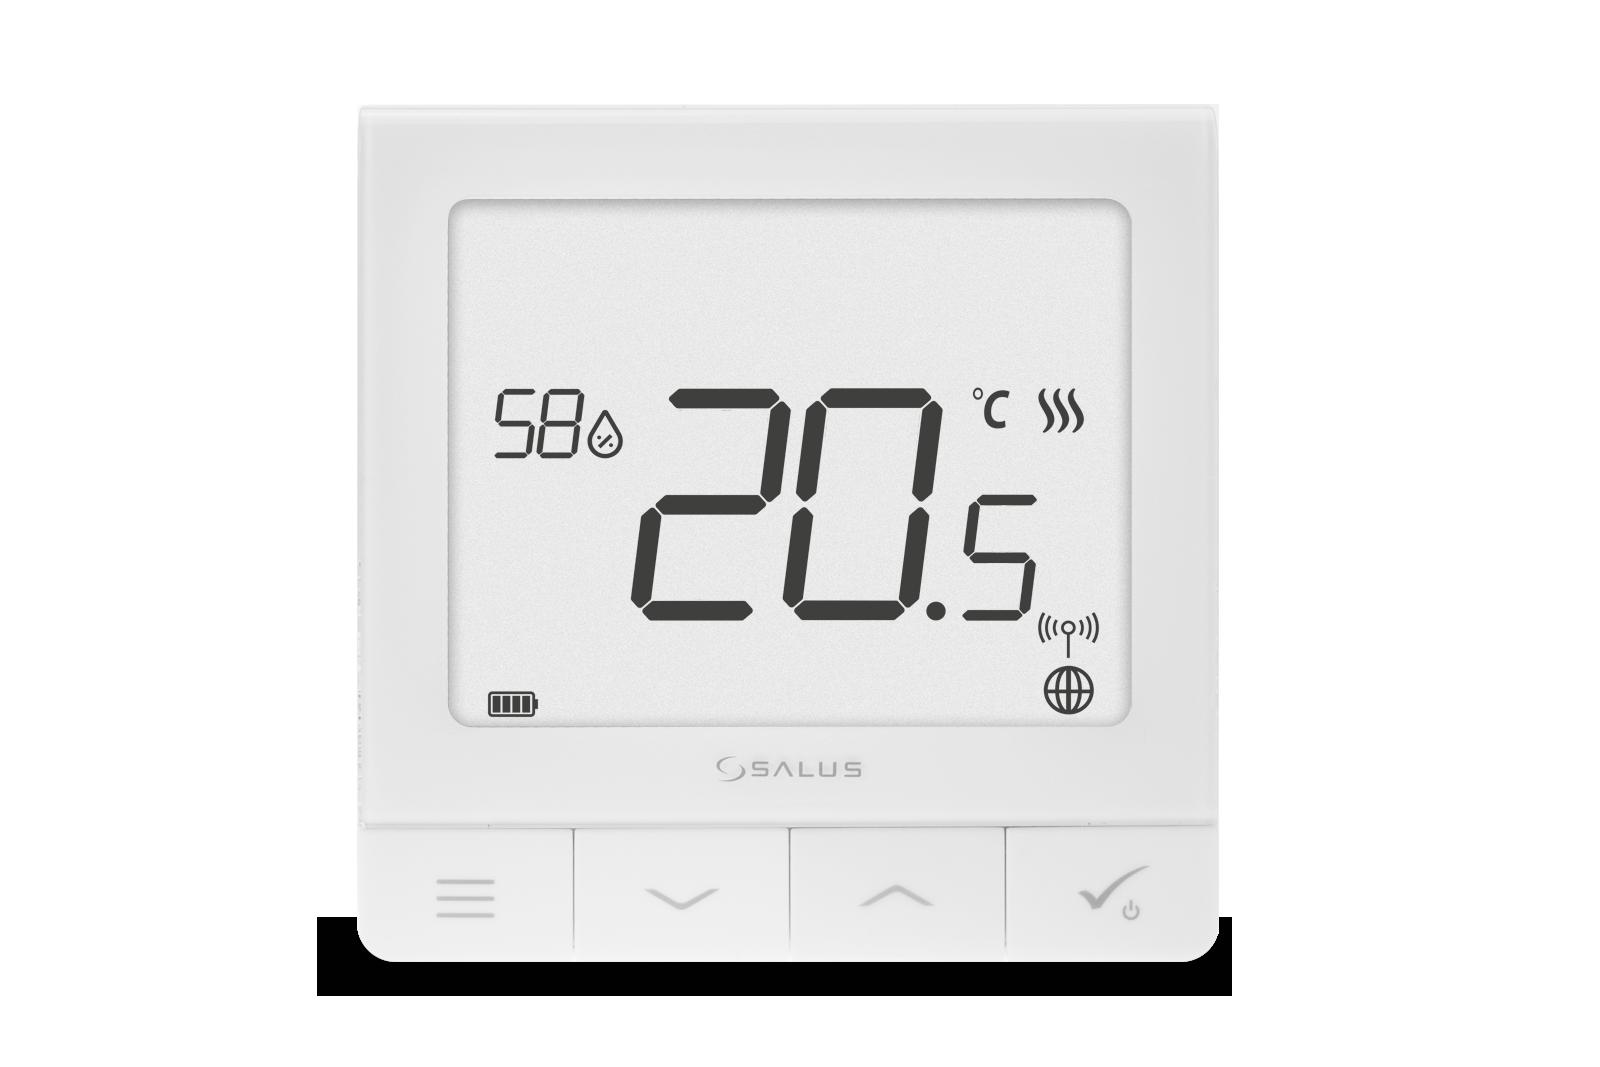 Controlla la temperatura